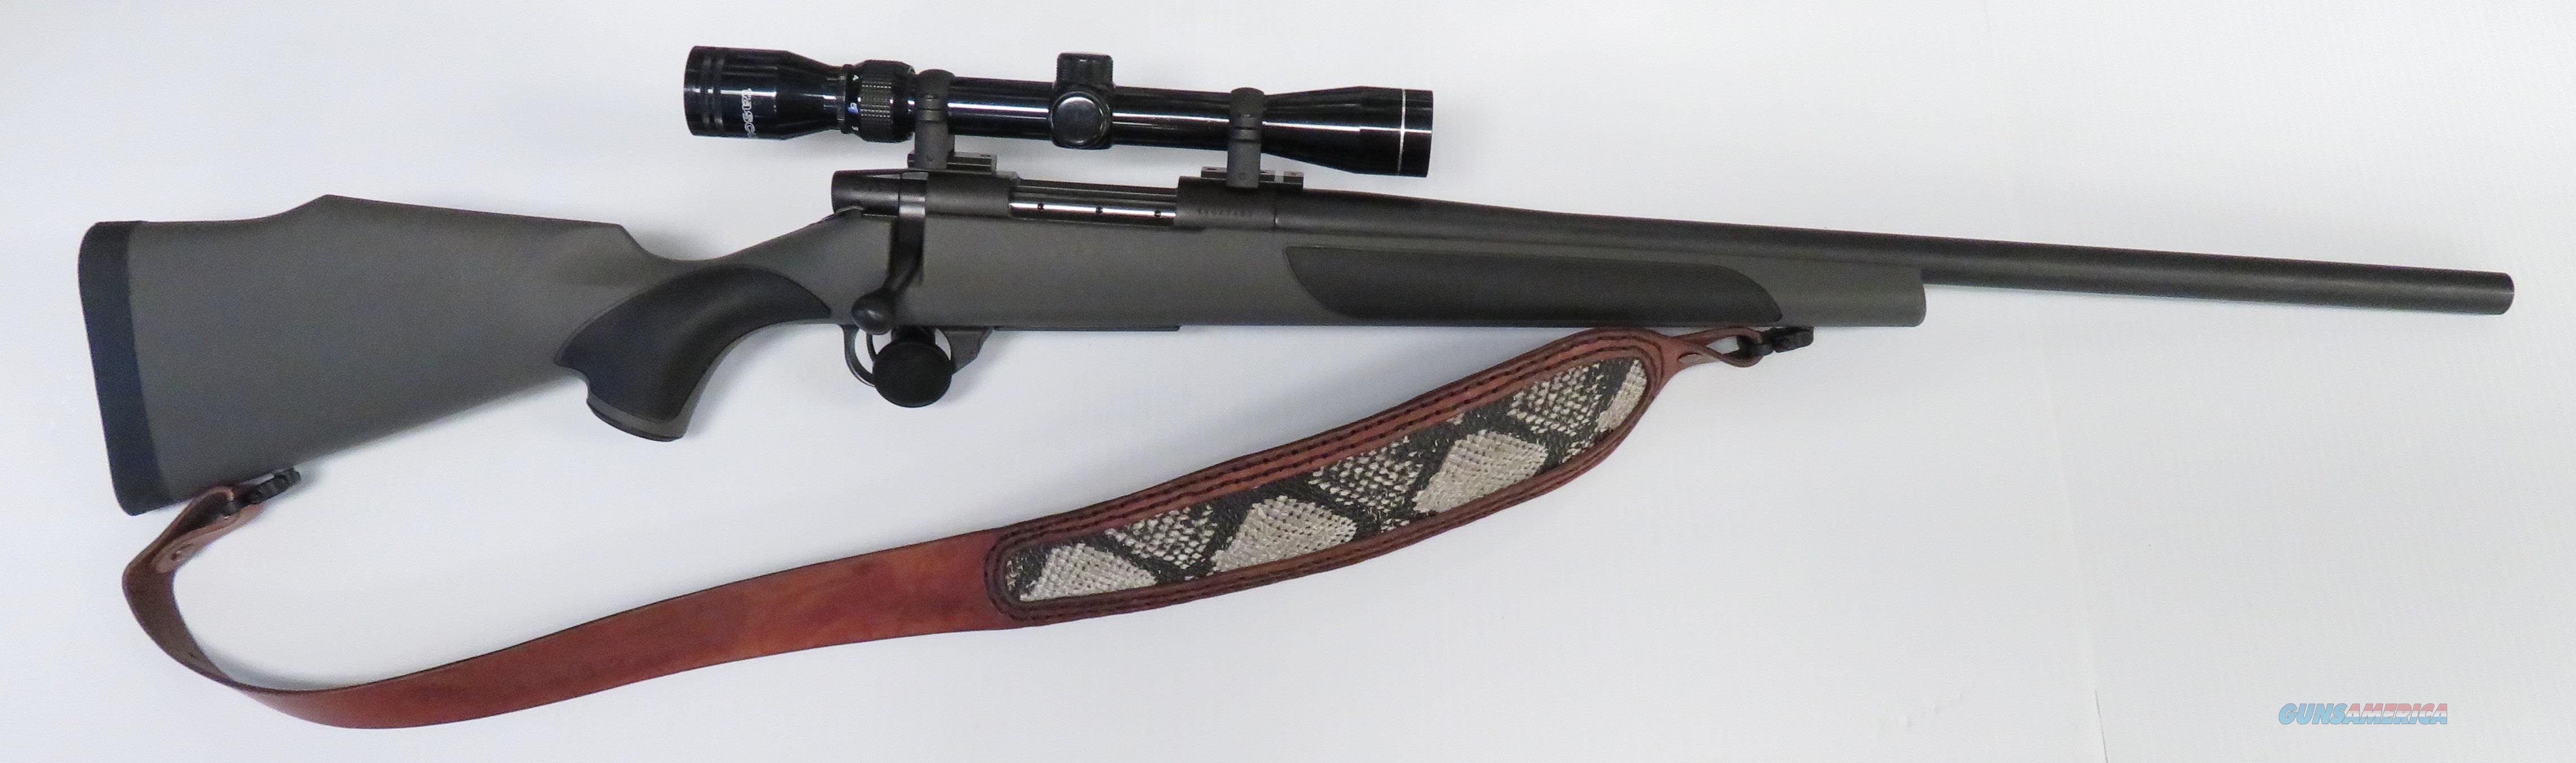 "Weatherby Vanguard Series 2 (Griptonite Stock) VBT222RR2O Varmint Special 22-250 Bolt-Action Rifle 22"" Barrel w/ Tasco 3-9x32 Optic & Snakeskin Sling  Guns > Rifles > Weatherby Rifles > Sporting"